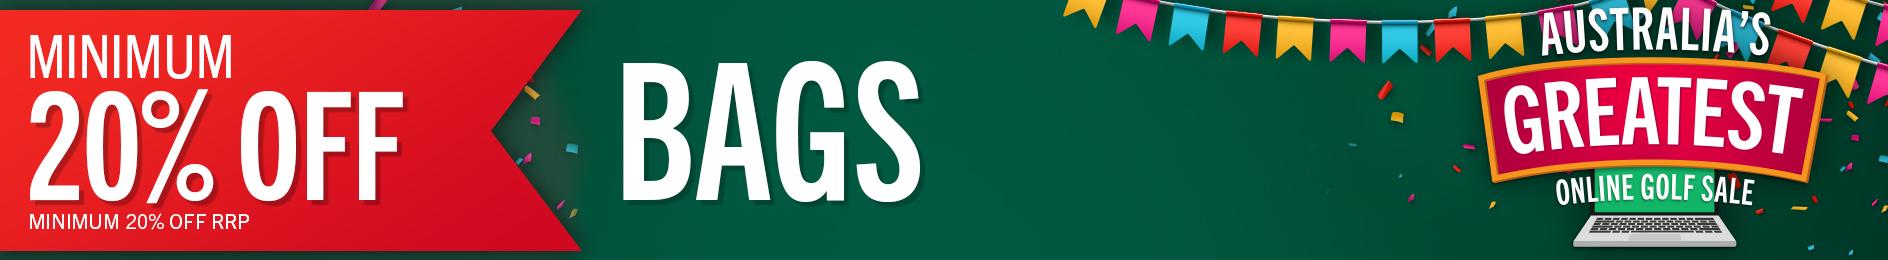 GolfBox Online Sale - Minimum 20% Off Bags